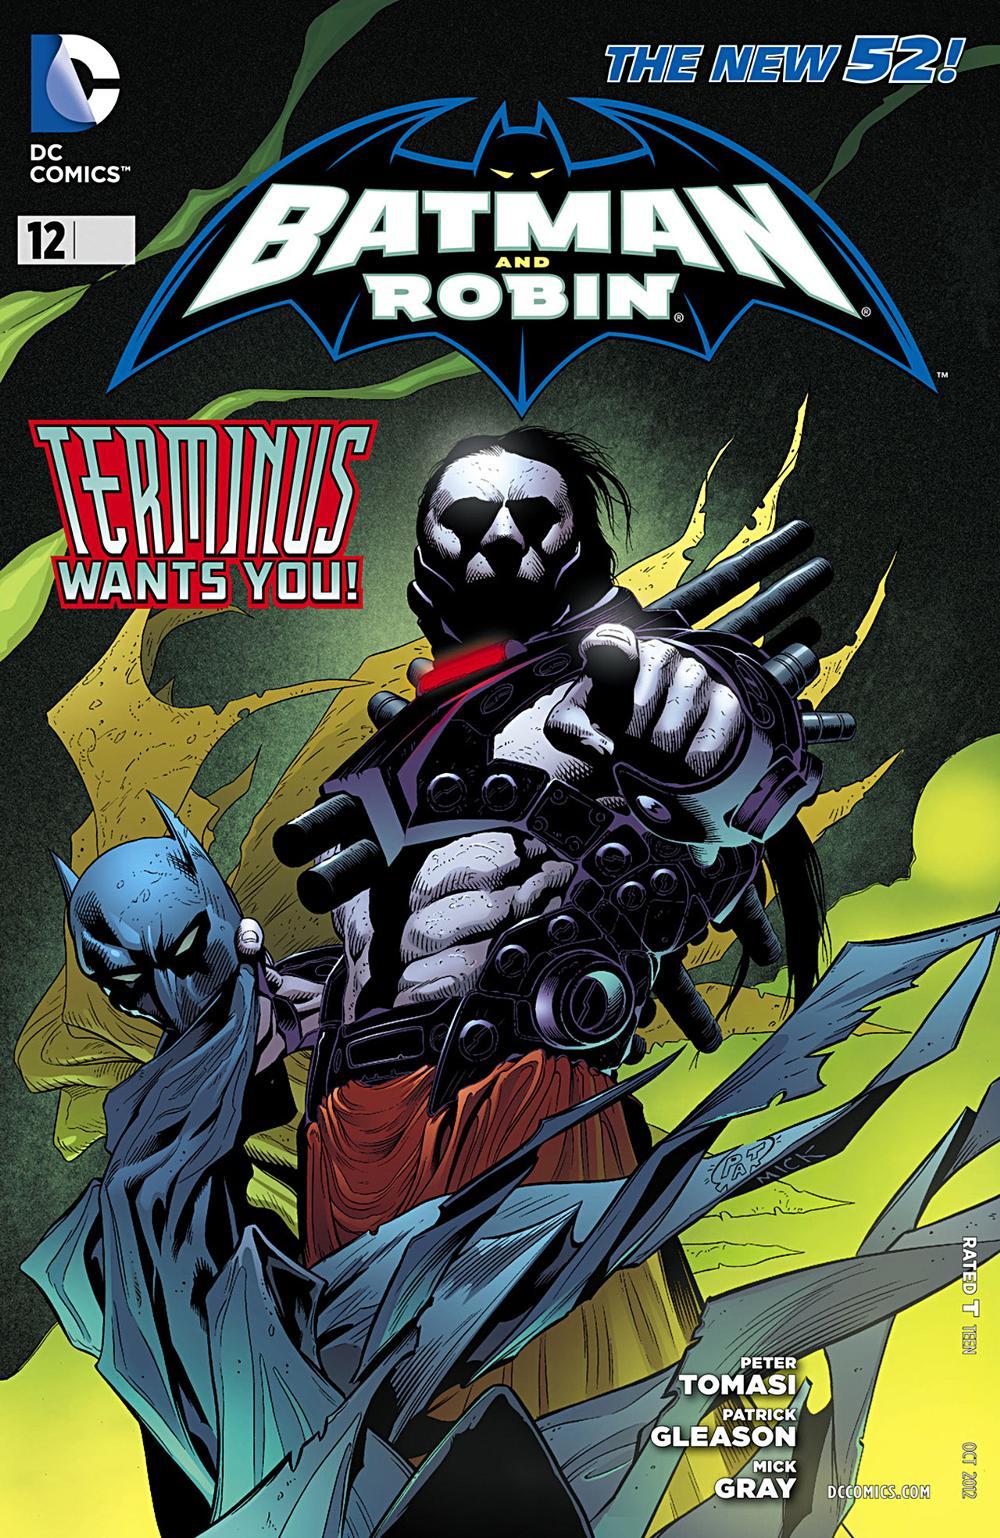 Batman & Robin 12 - Batman and Robin - Terminus Wants You